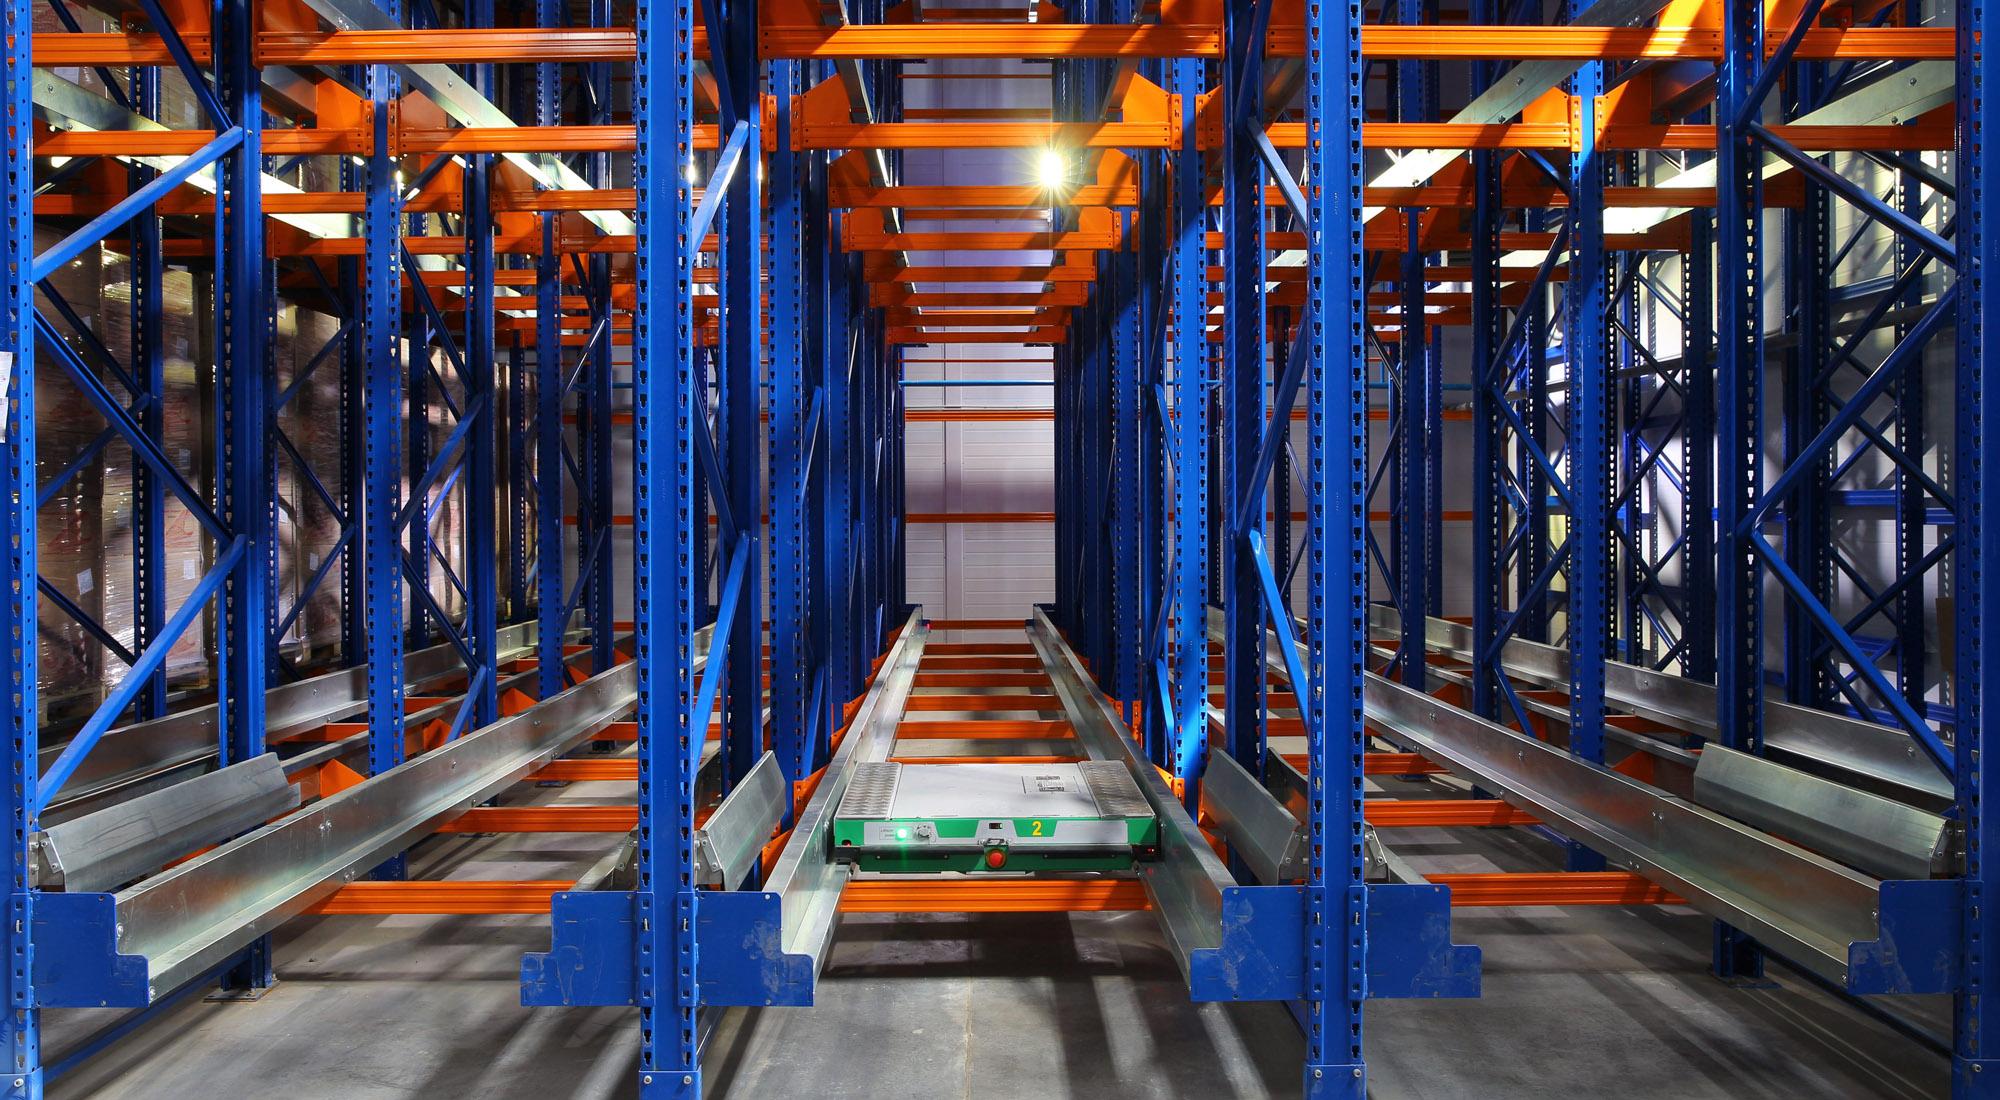 Racking, Shelving and Storage Equipment